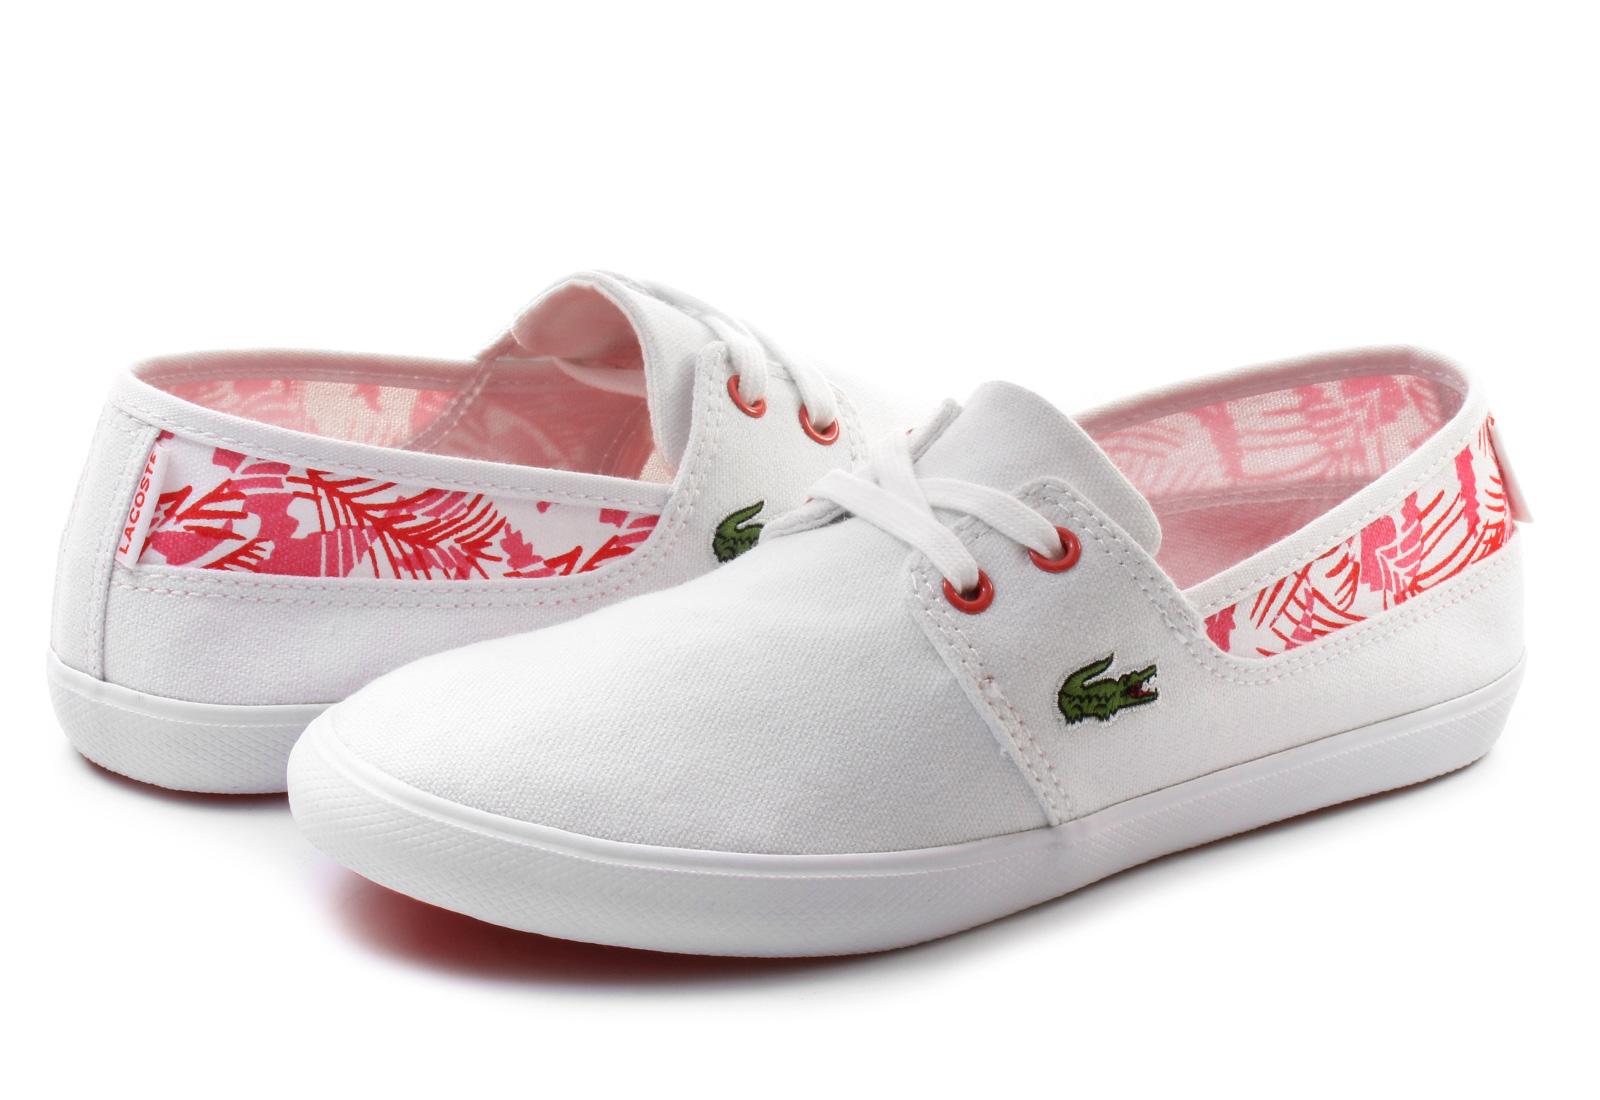 Lacoste Cipő - Marice Lace - 151spw1017-286 - Office Shoes Magyarország c4eb7ccd68